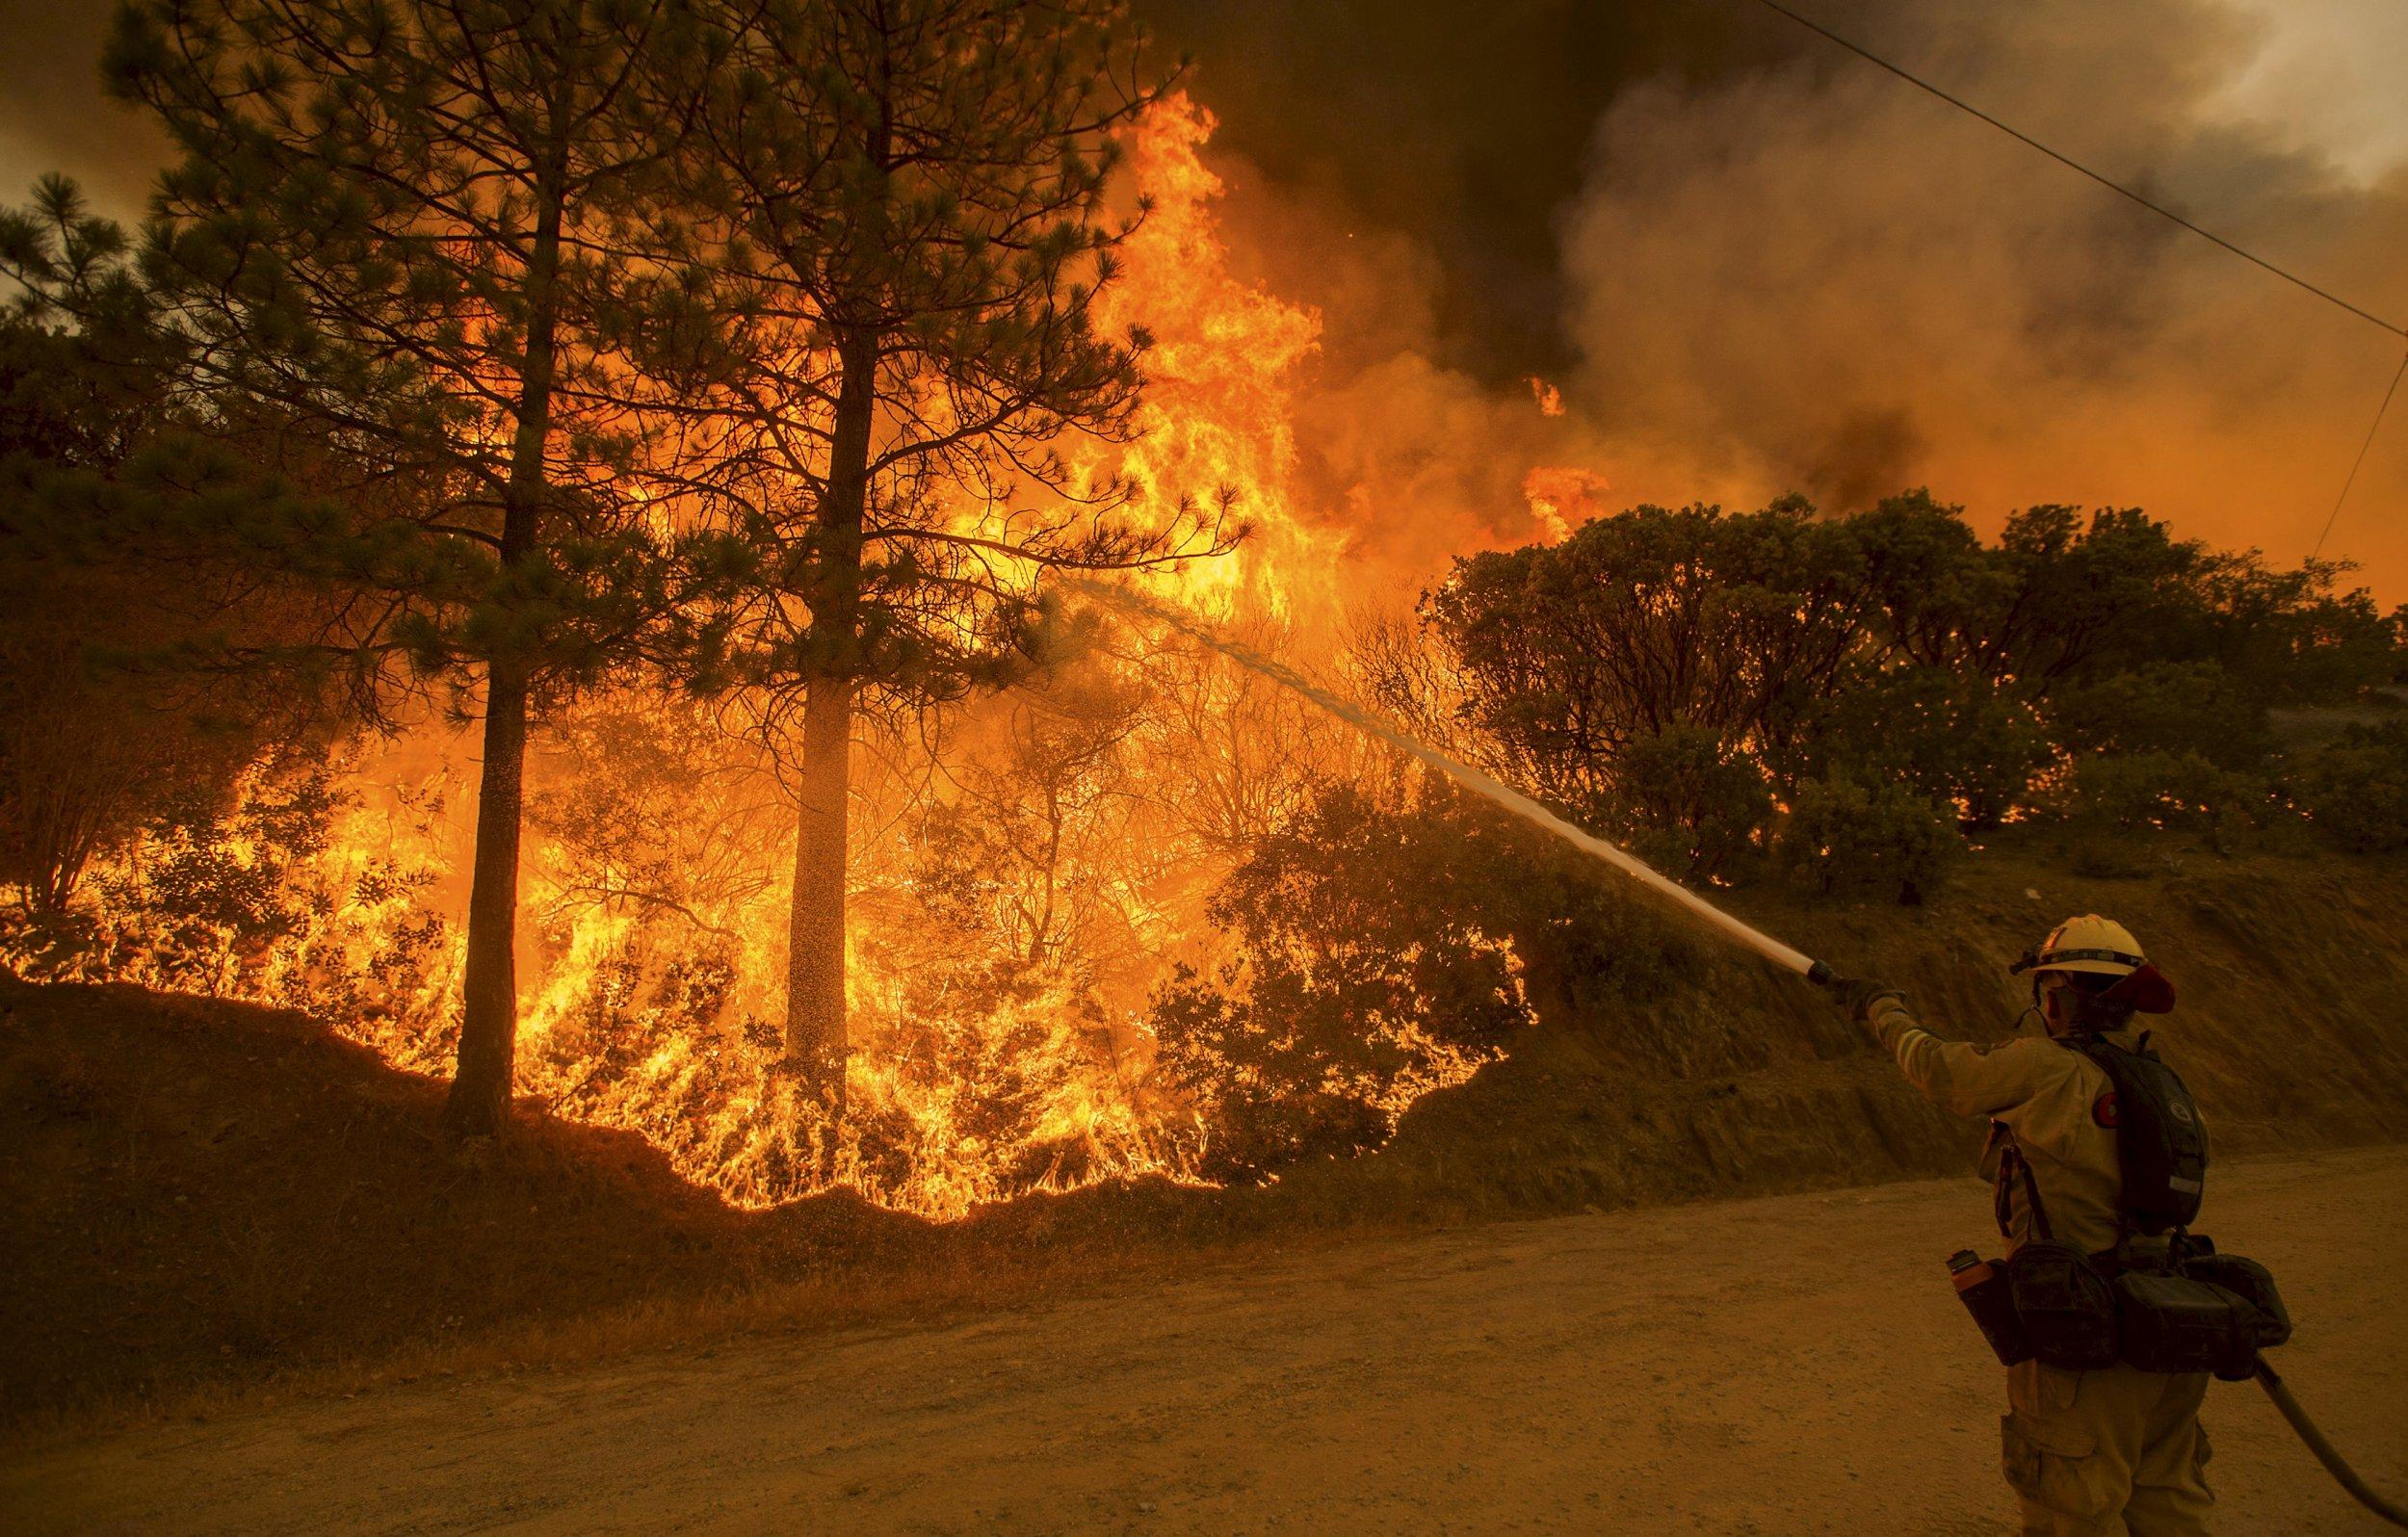 09_13_2015_california_fire